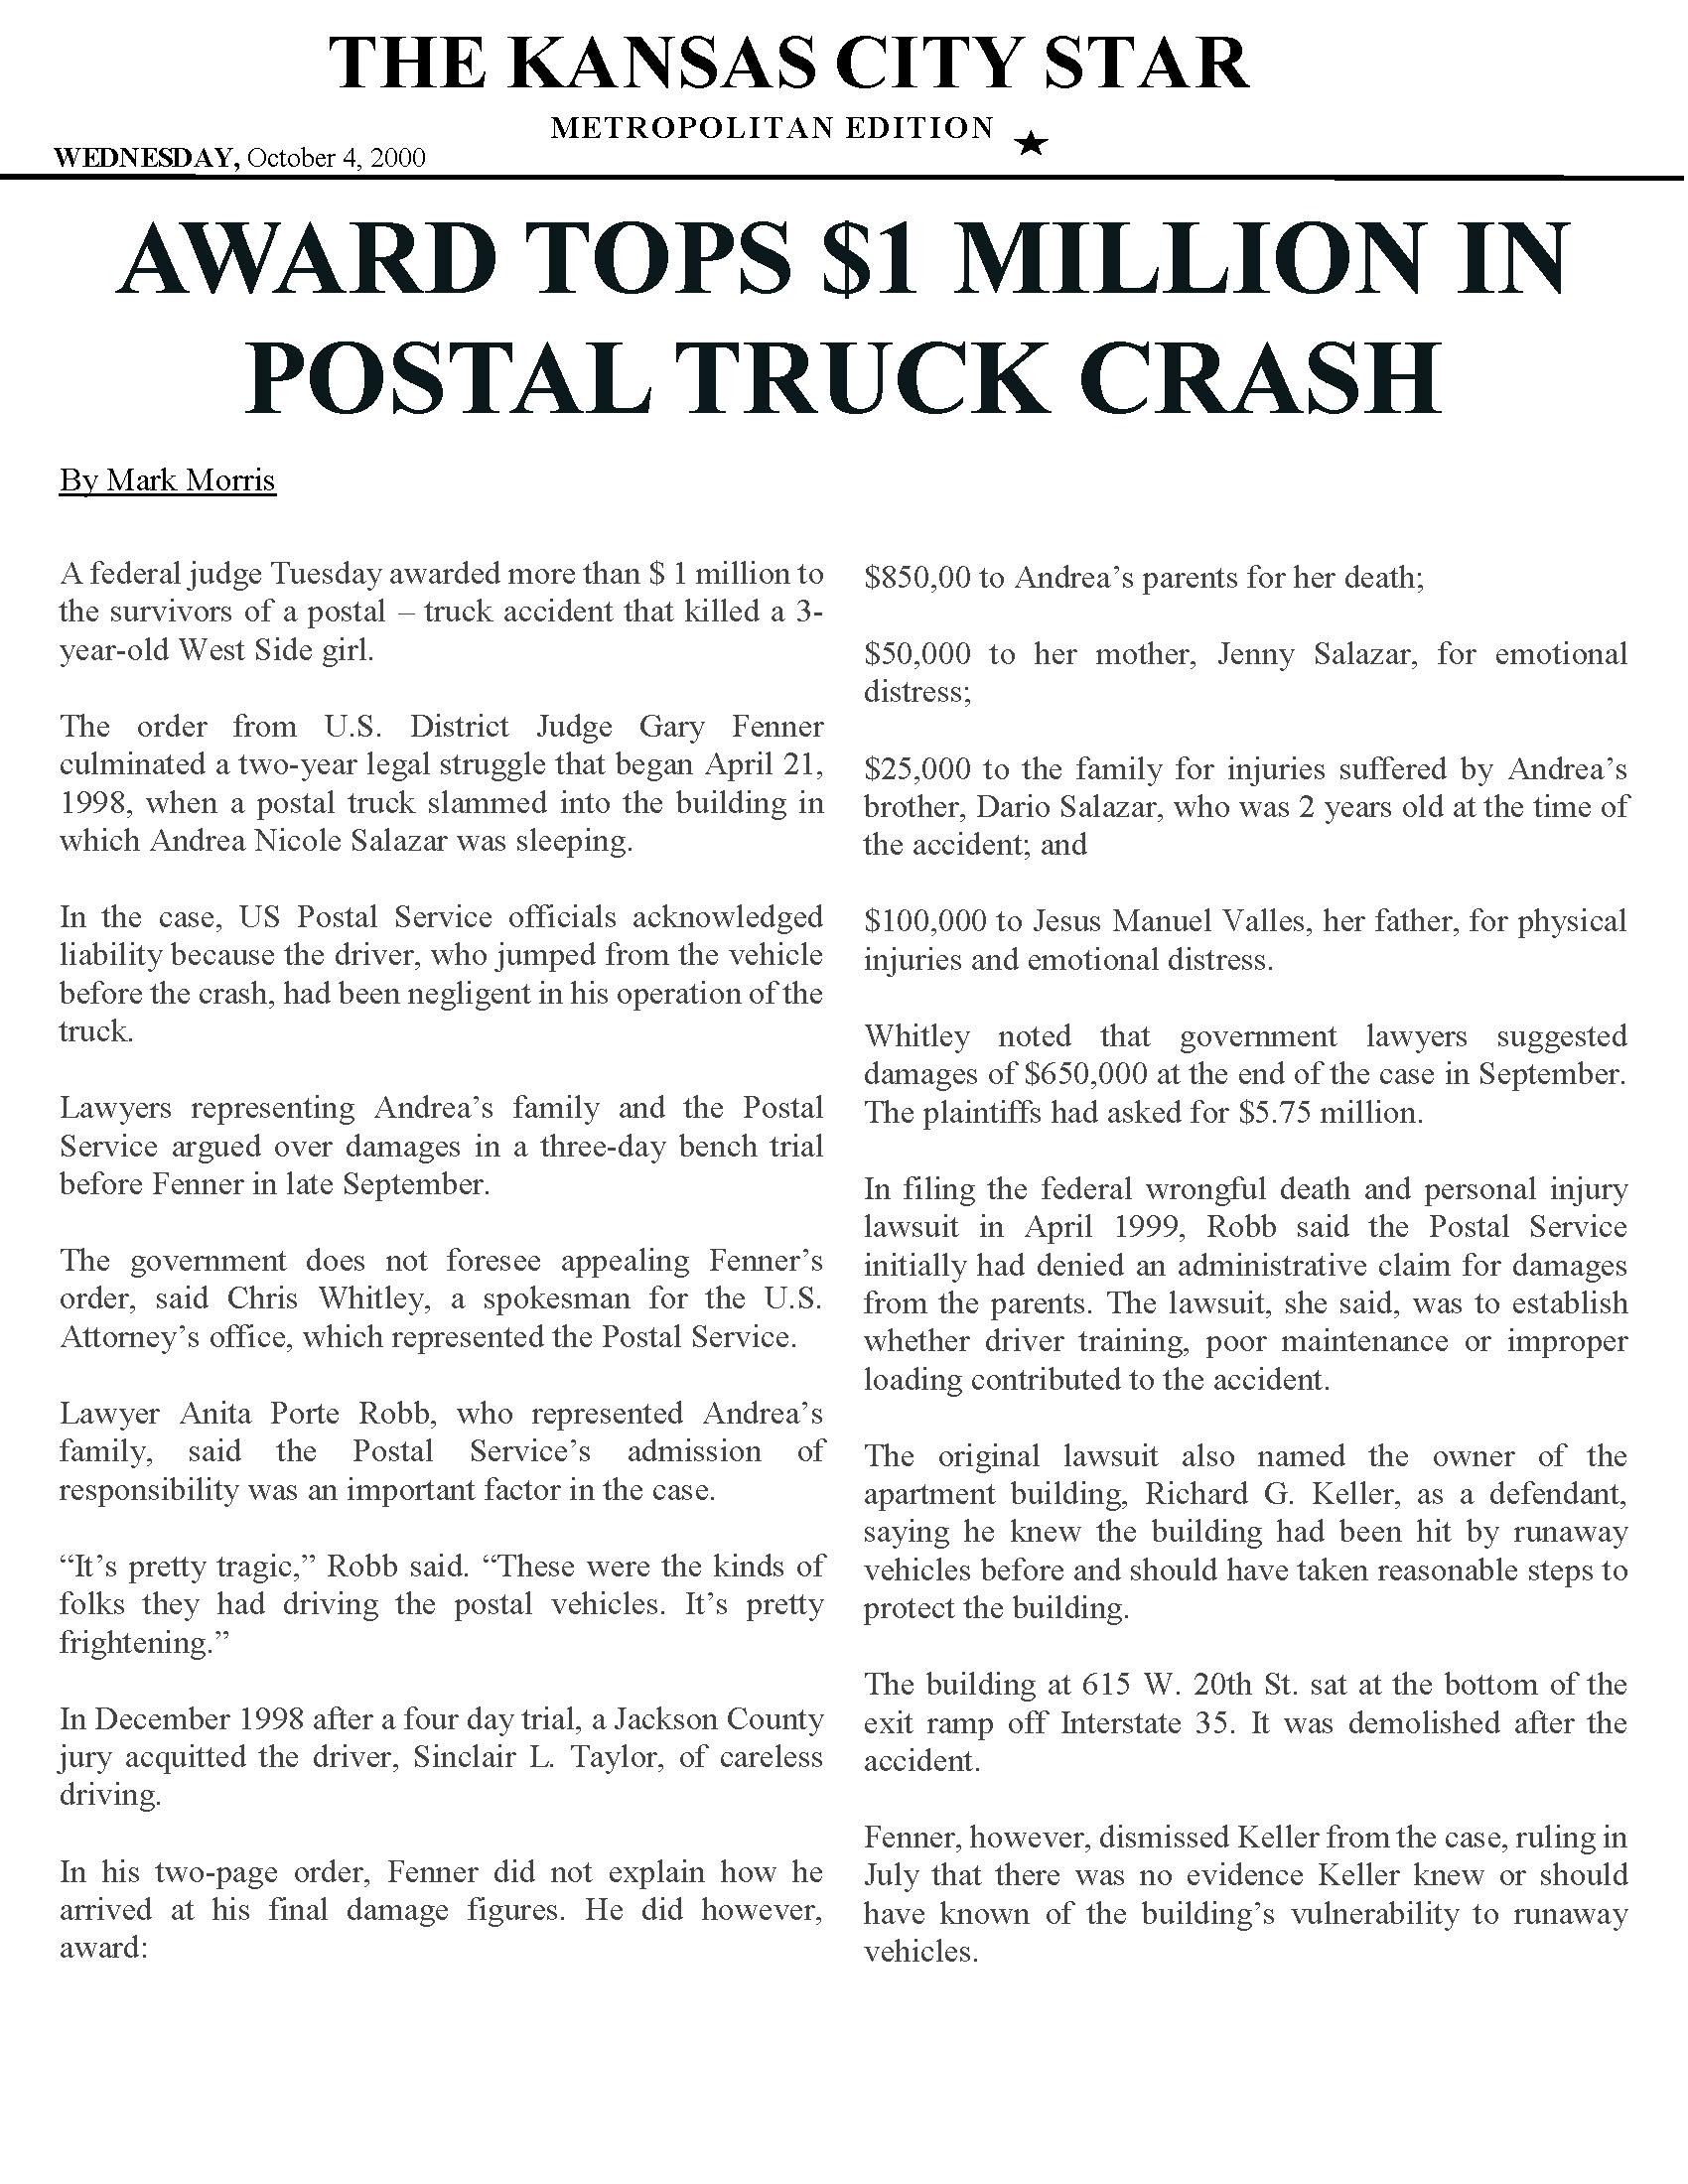 Transportation Accident Attorney - Personal Injury Attorneys - Robb